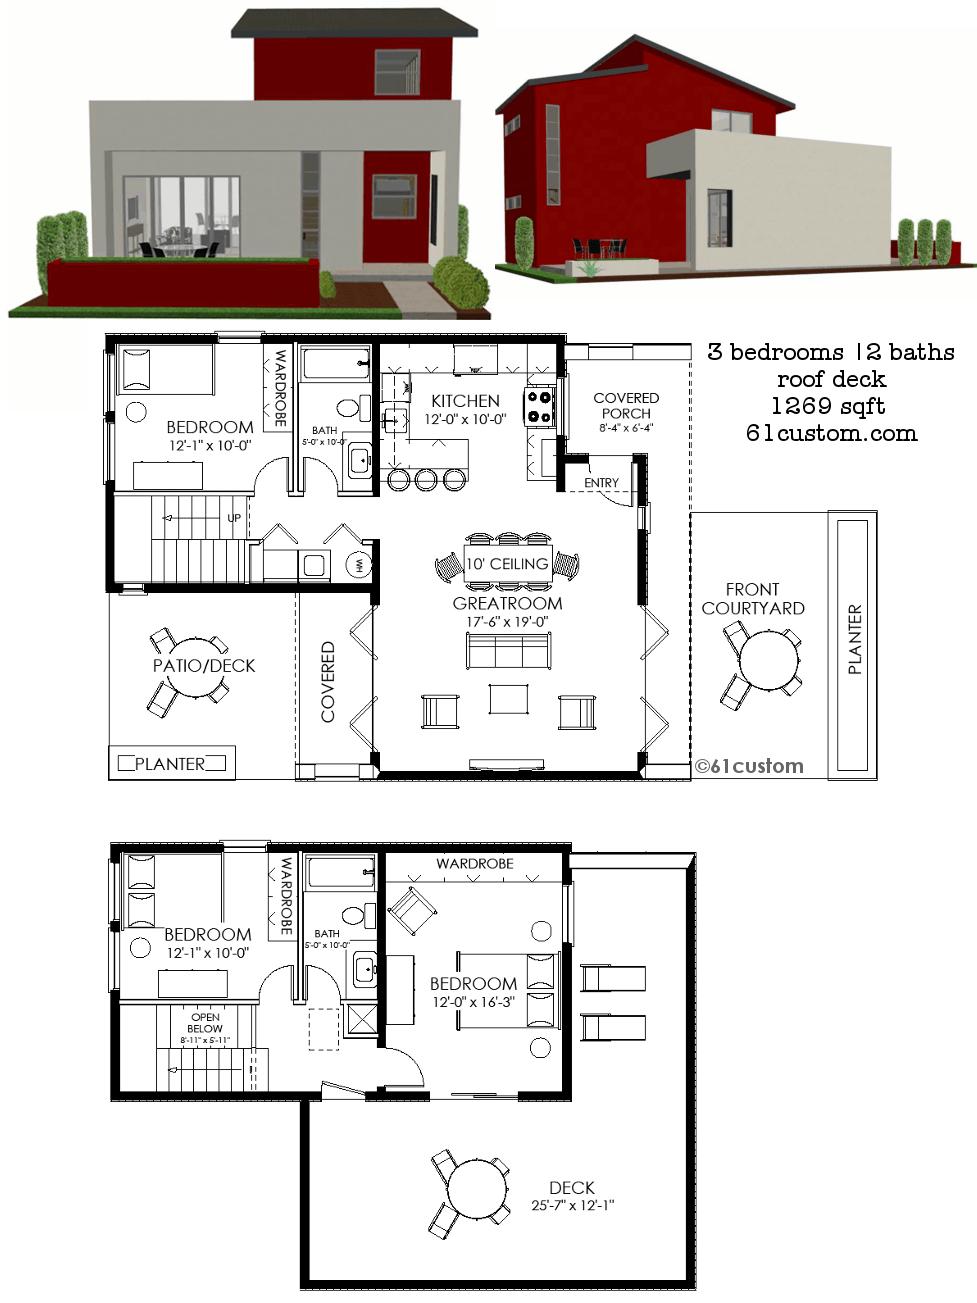 Contemporary Small House Plan 61custom Contemporary Modern House Plans